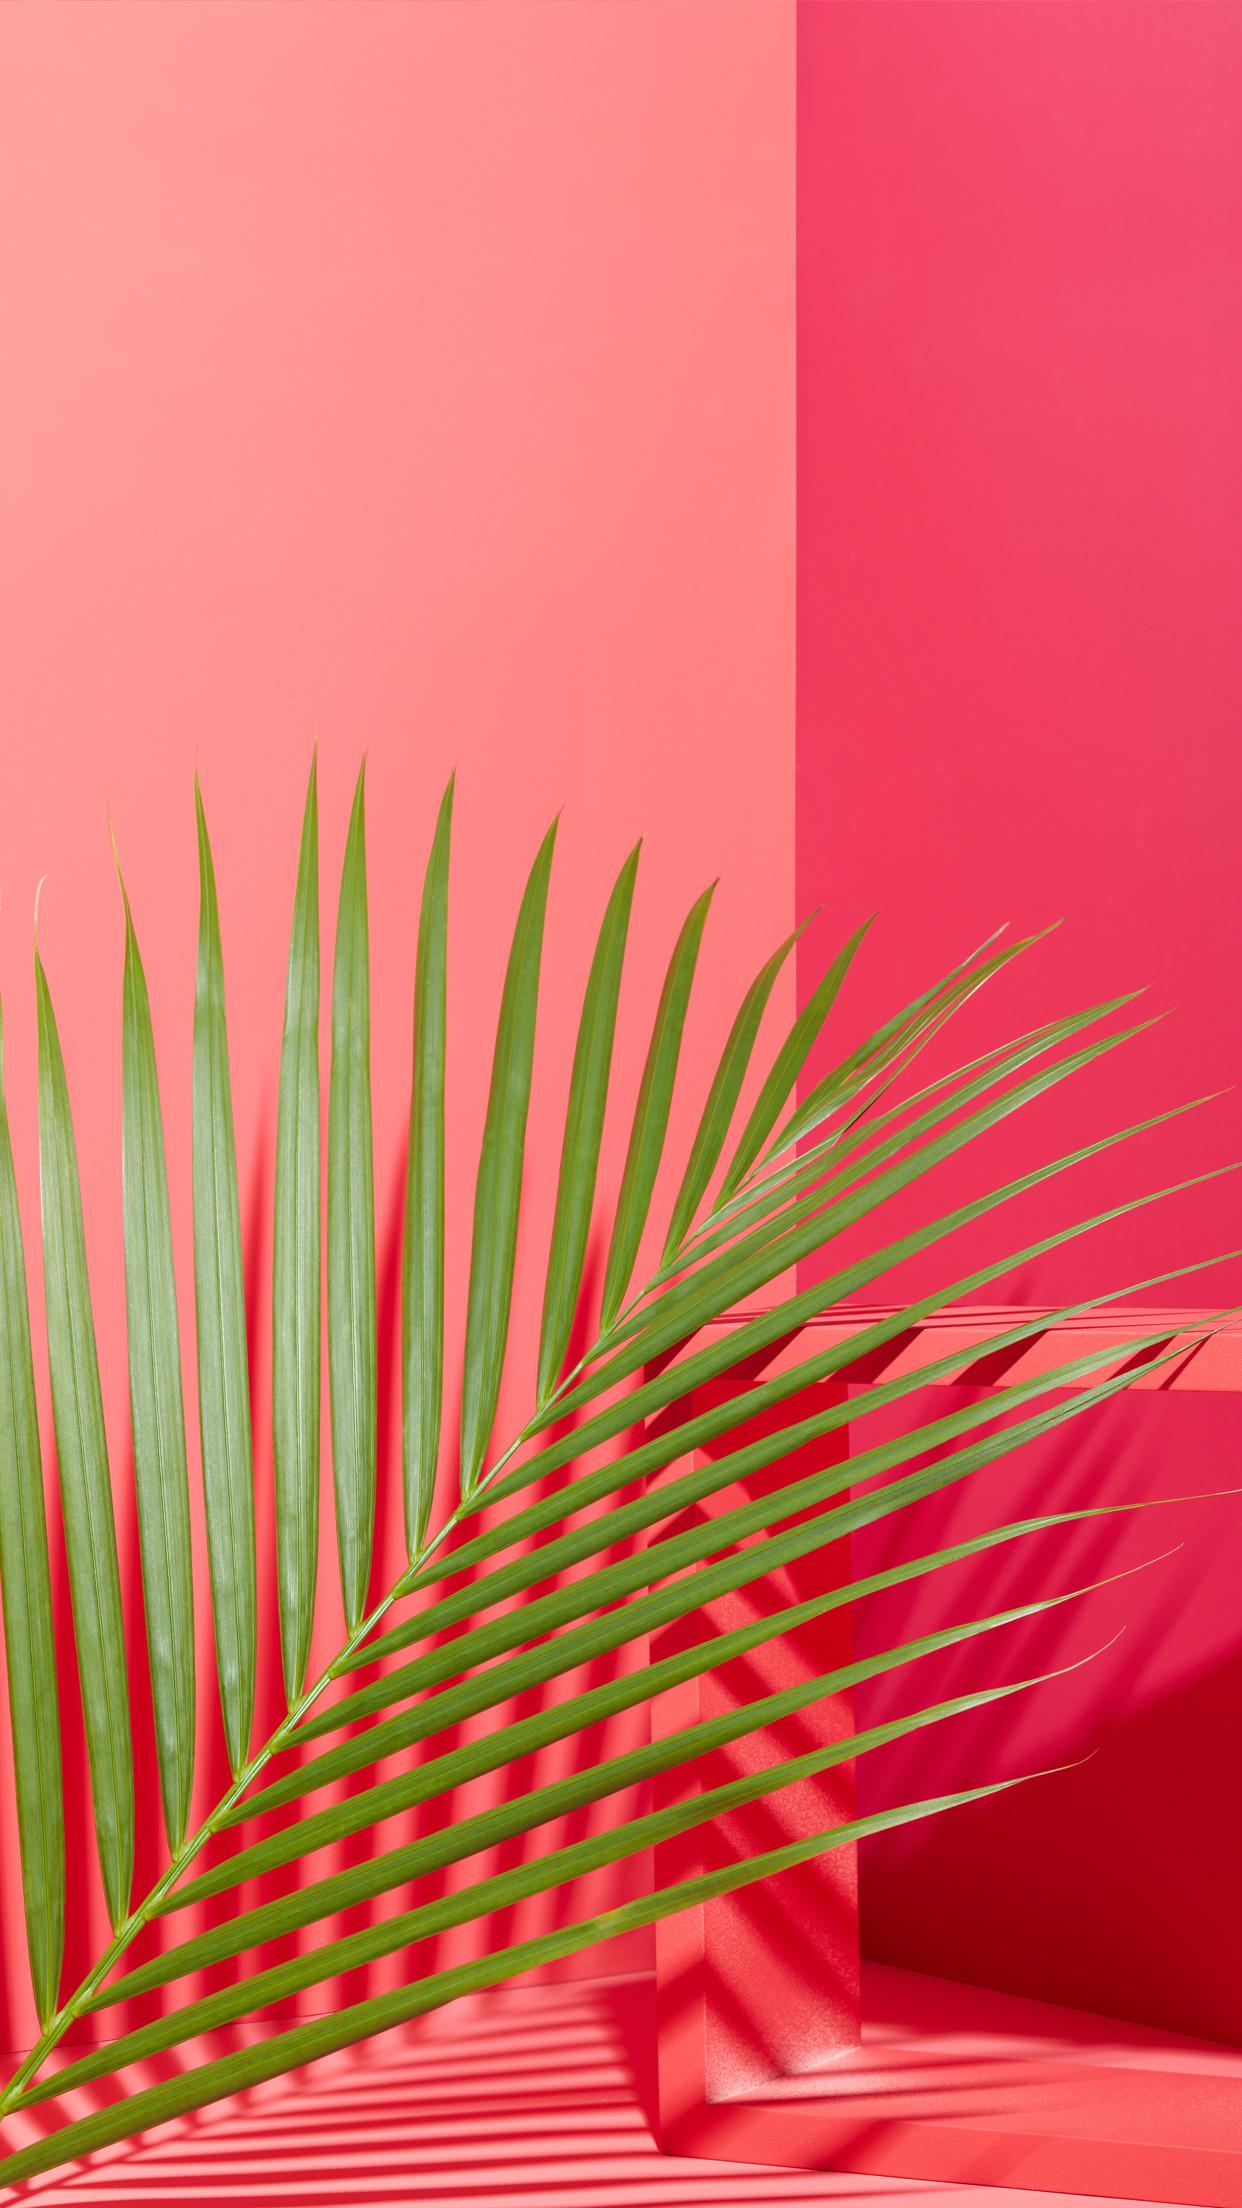 west elm – Tropical Leaves + Pink Mobile Wallpaper Download